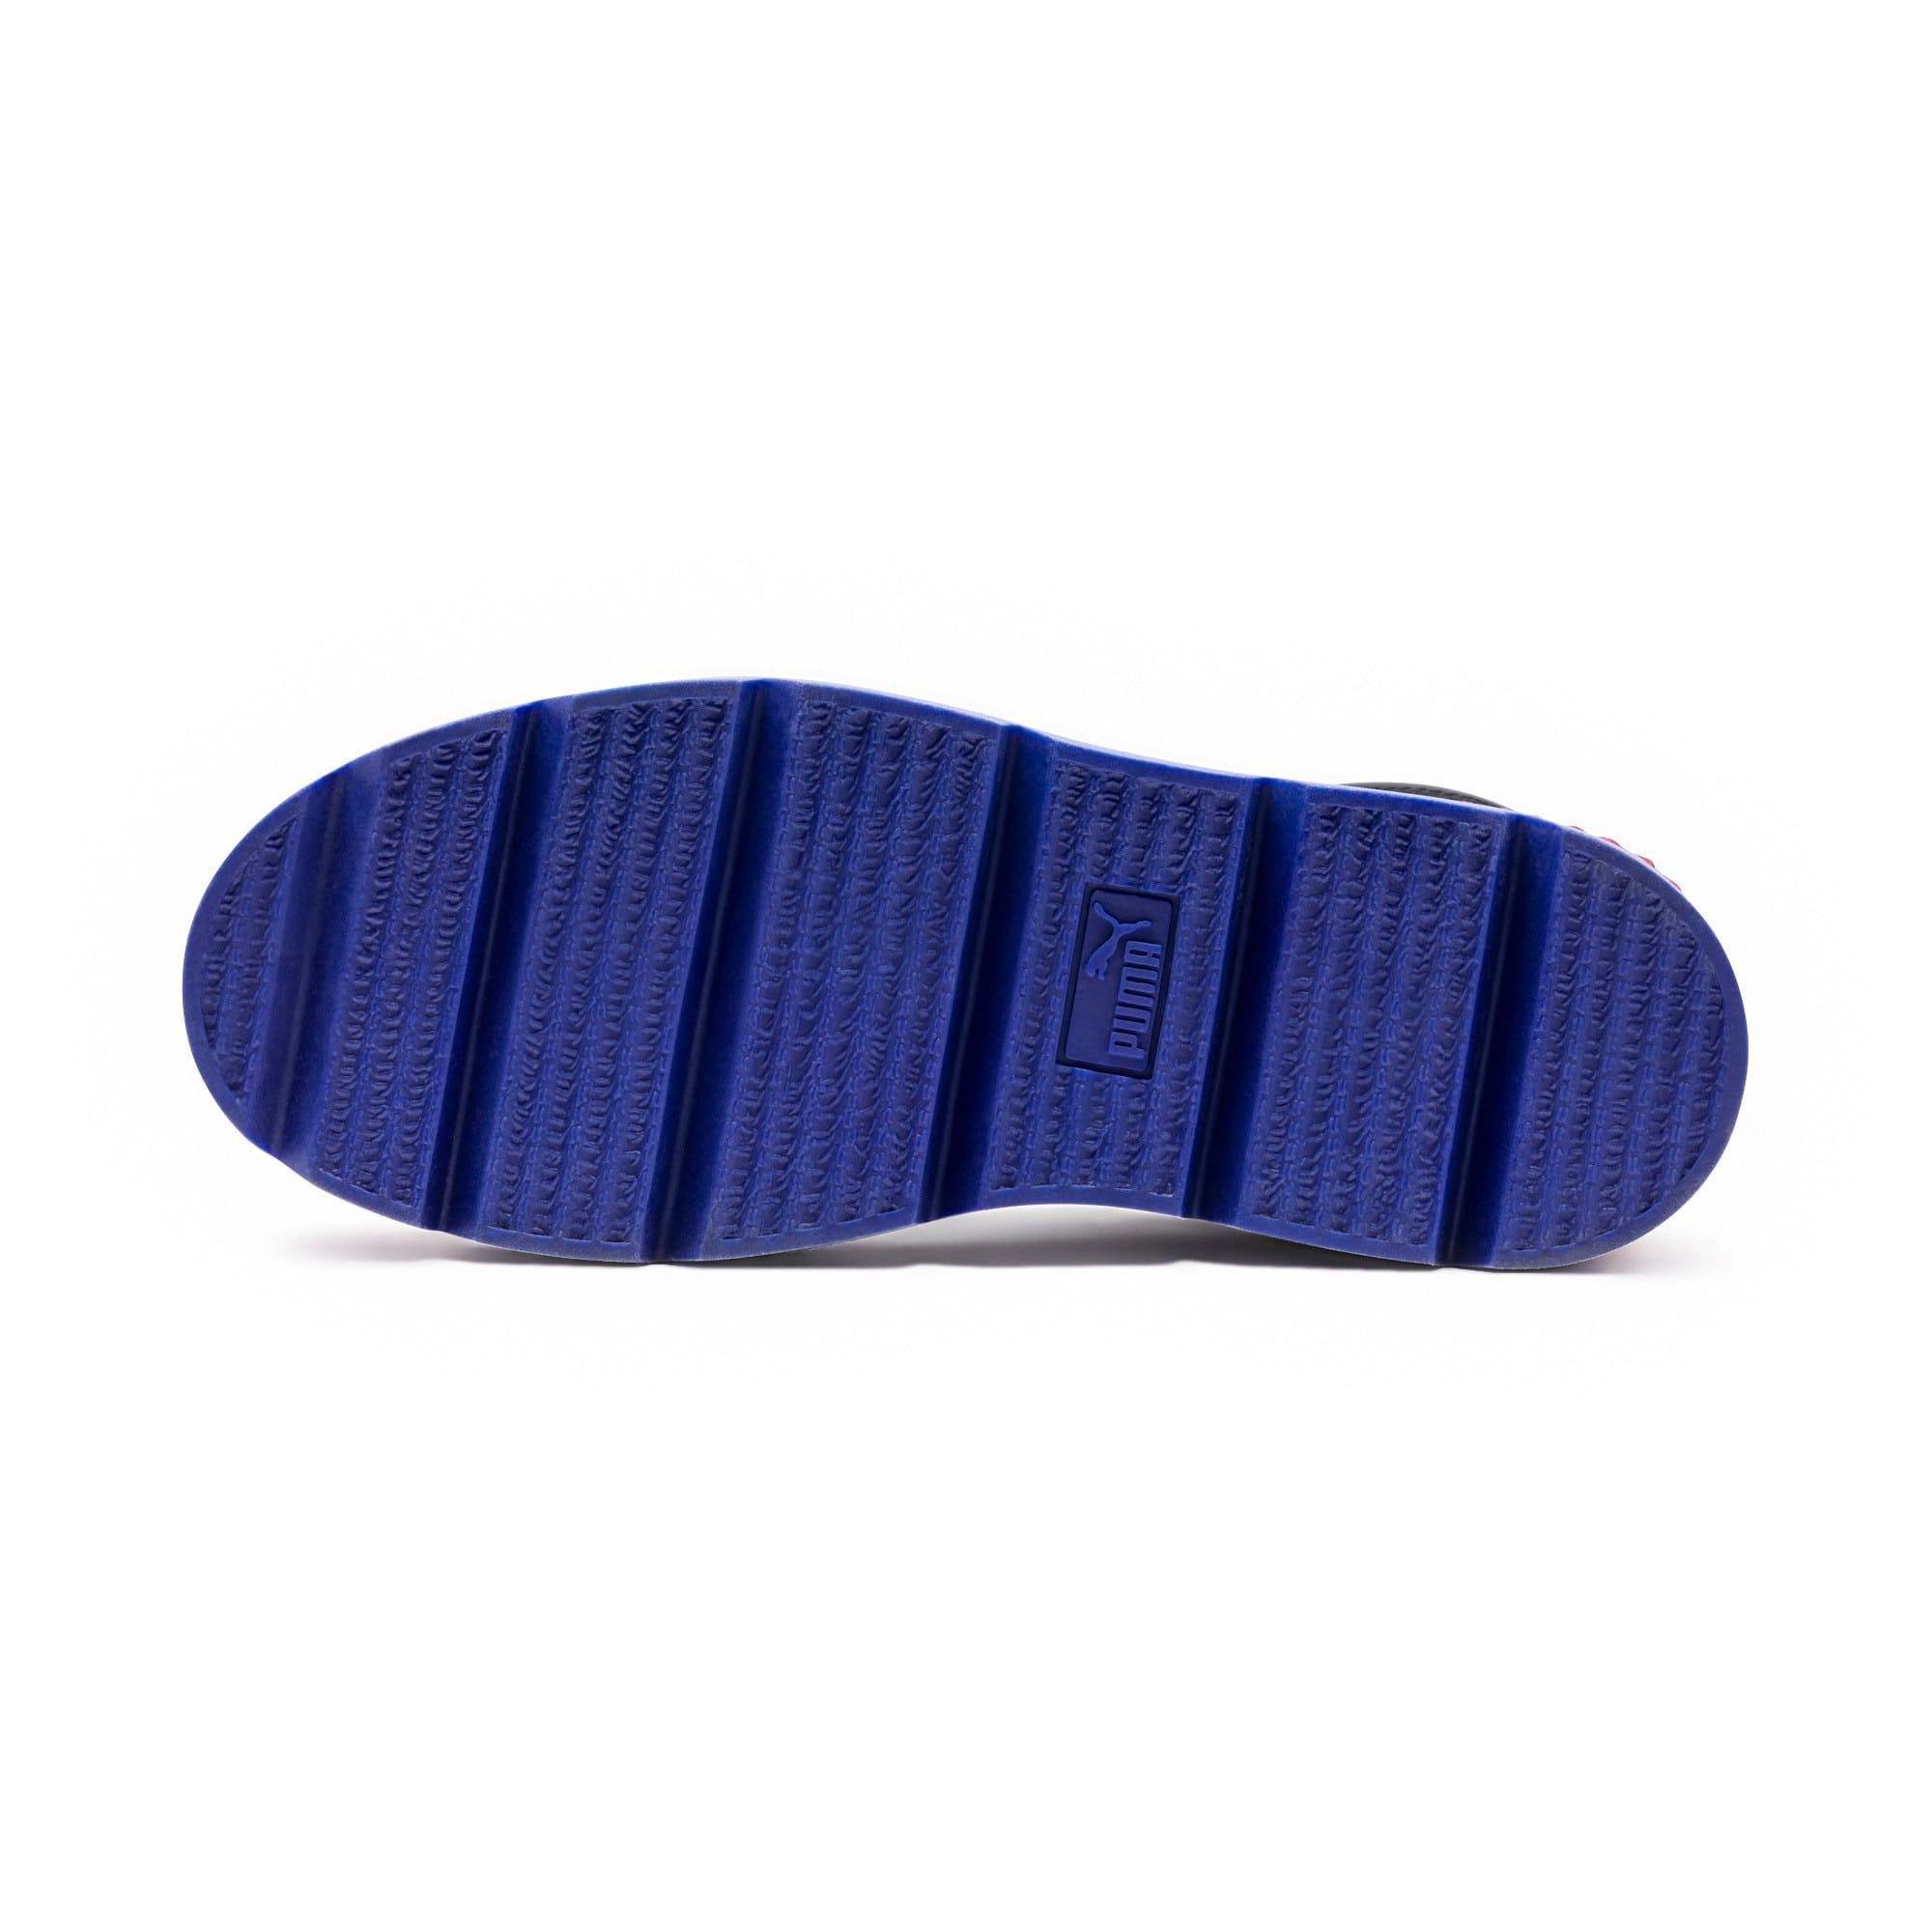 Thumbnail 5 of FENTY Women's Ankle Strap Trainer, Black-White-RedBud-Clematis, medium-IND